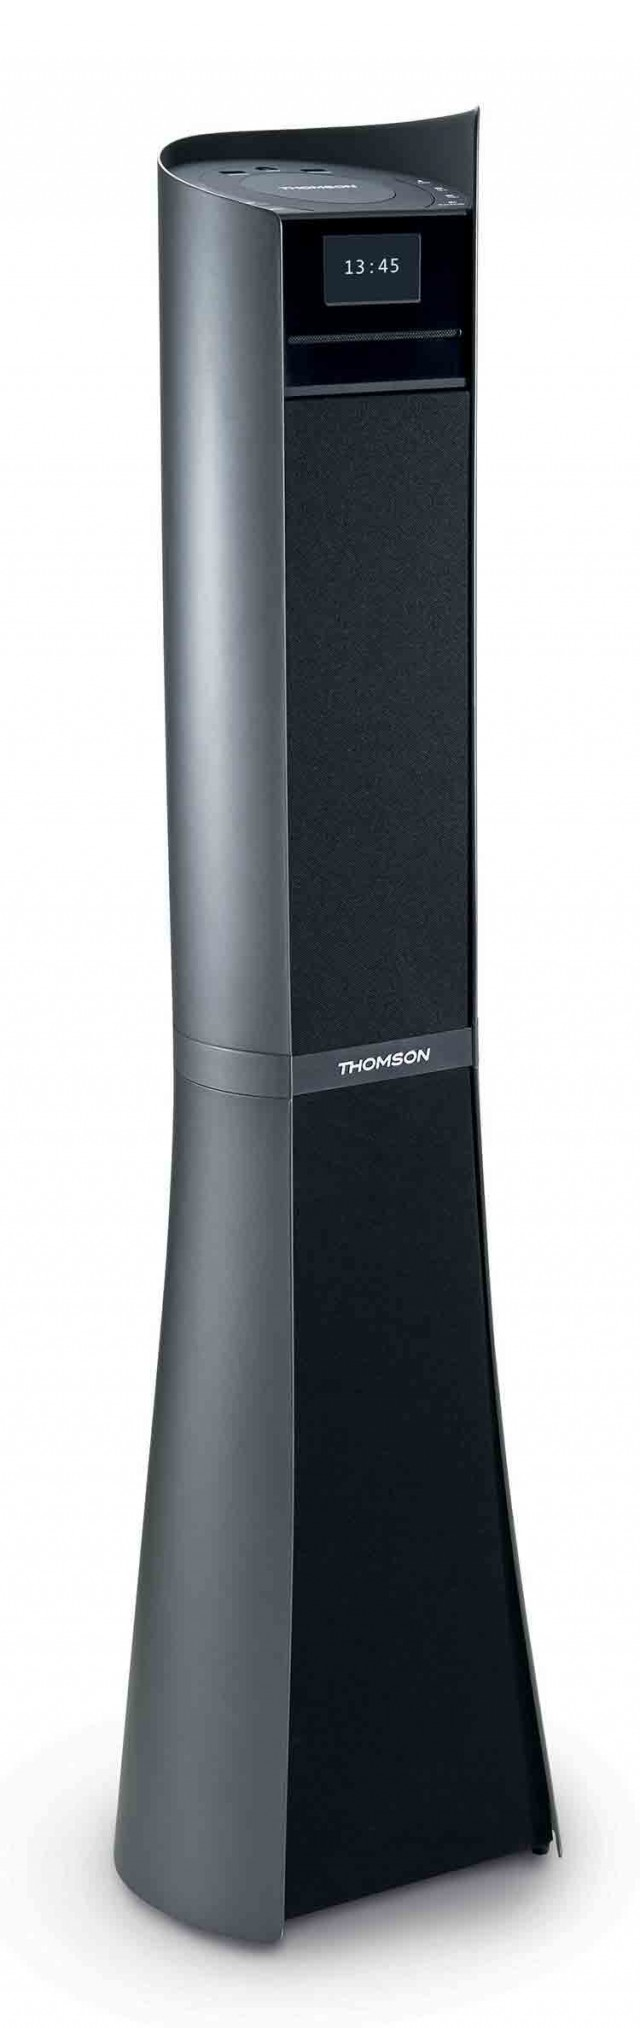 Thomson multimédia tower 'Ribbon' - Packshot